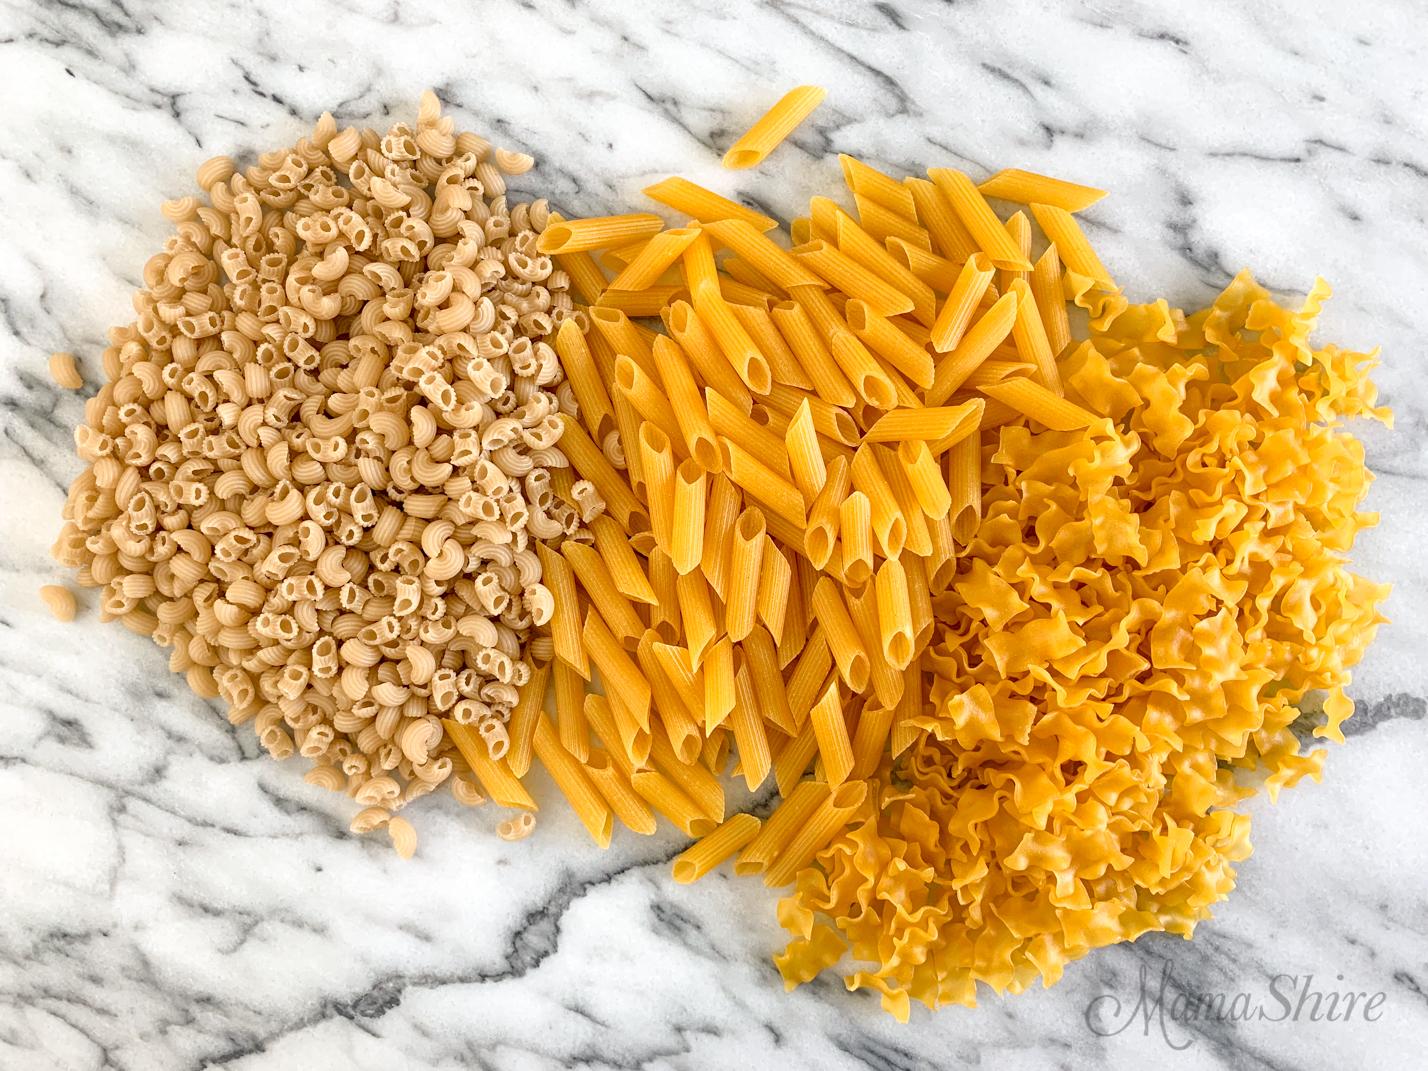 Three types of gluten-free pasta.